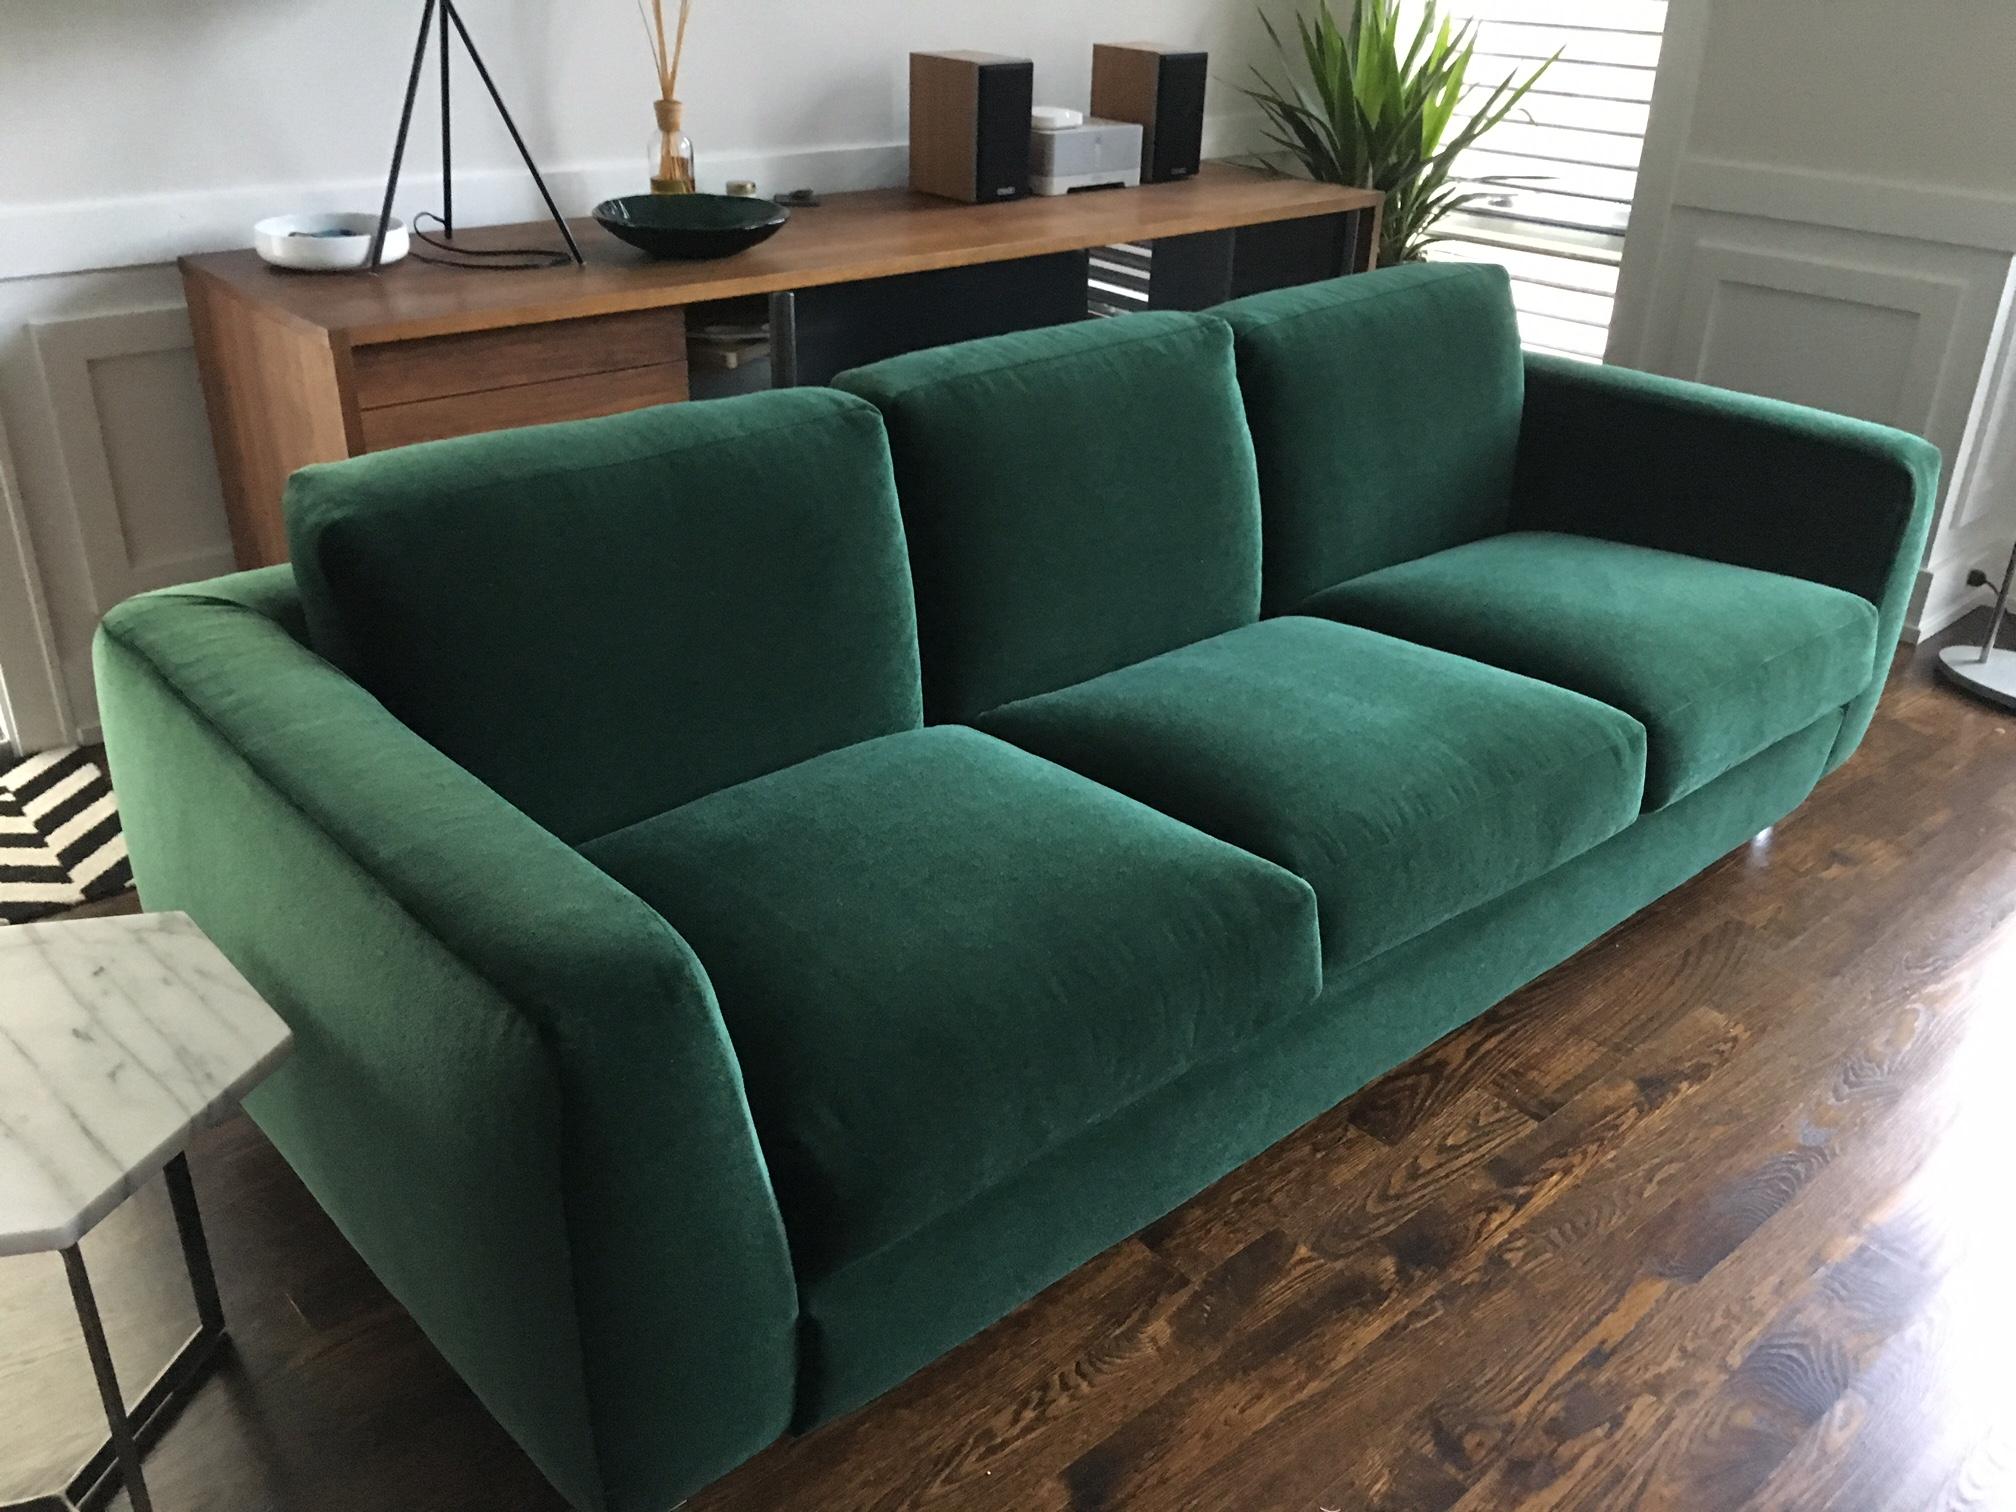 Recovered Interior Green Mohair Sofa